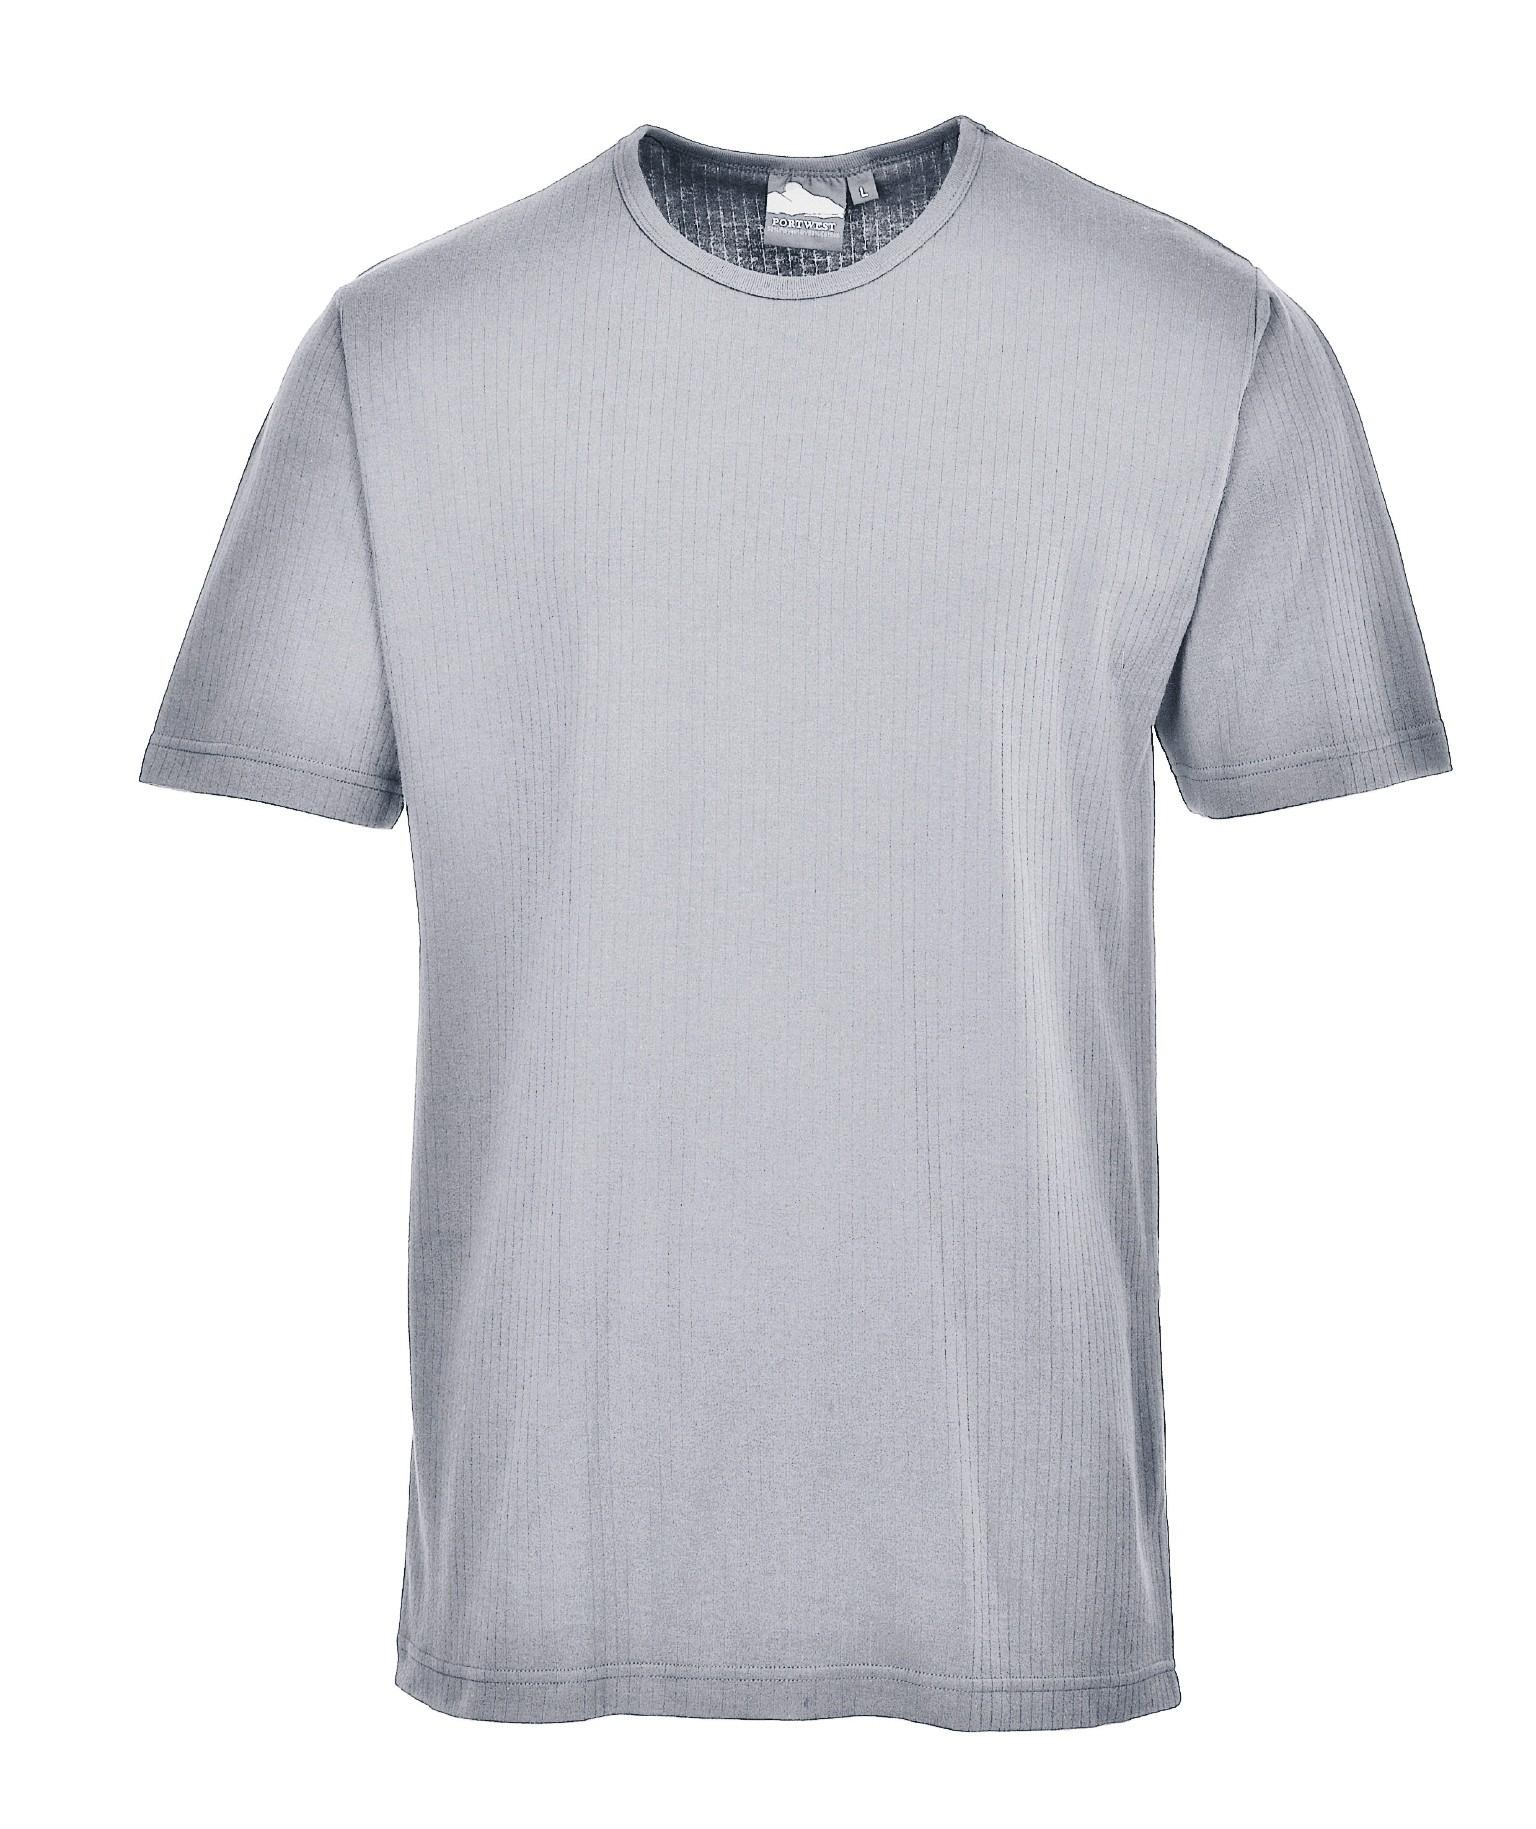 Short Sleeve Thermal T Shirt